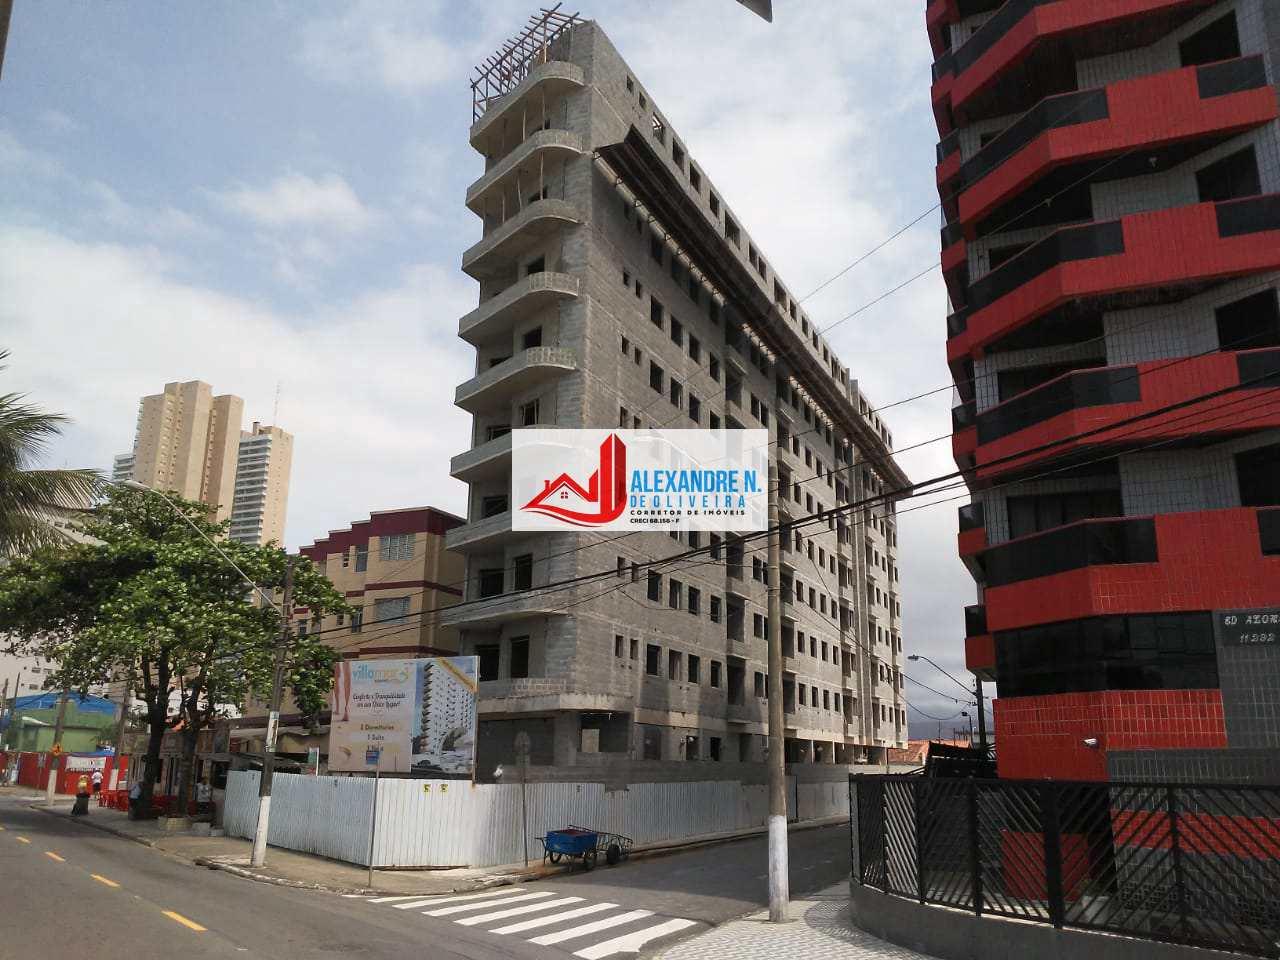 Frente-mar, 2 dorms, Mirim, Praia Grande - R$ 249 mil, AP00725